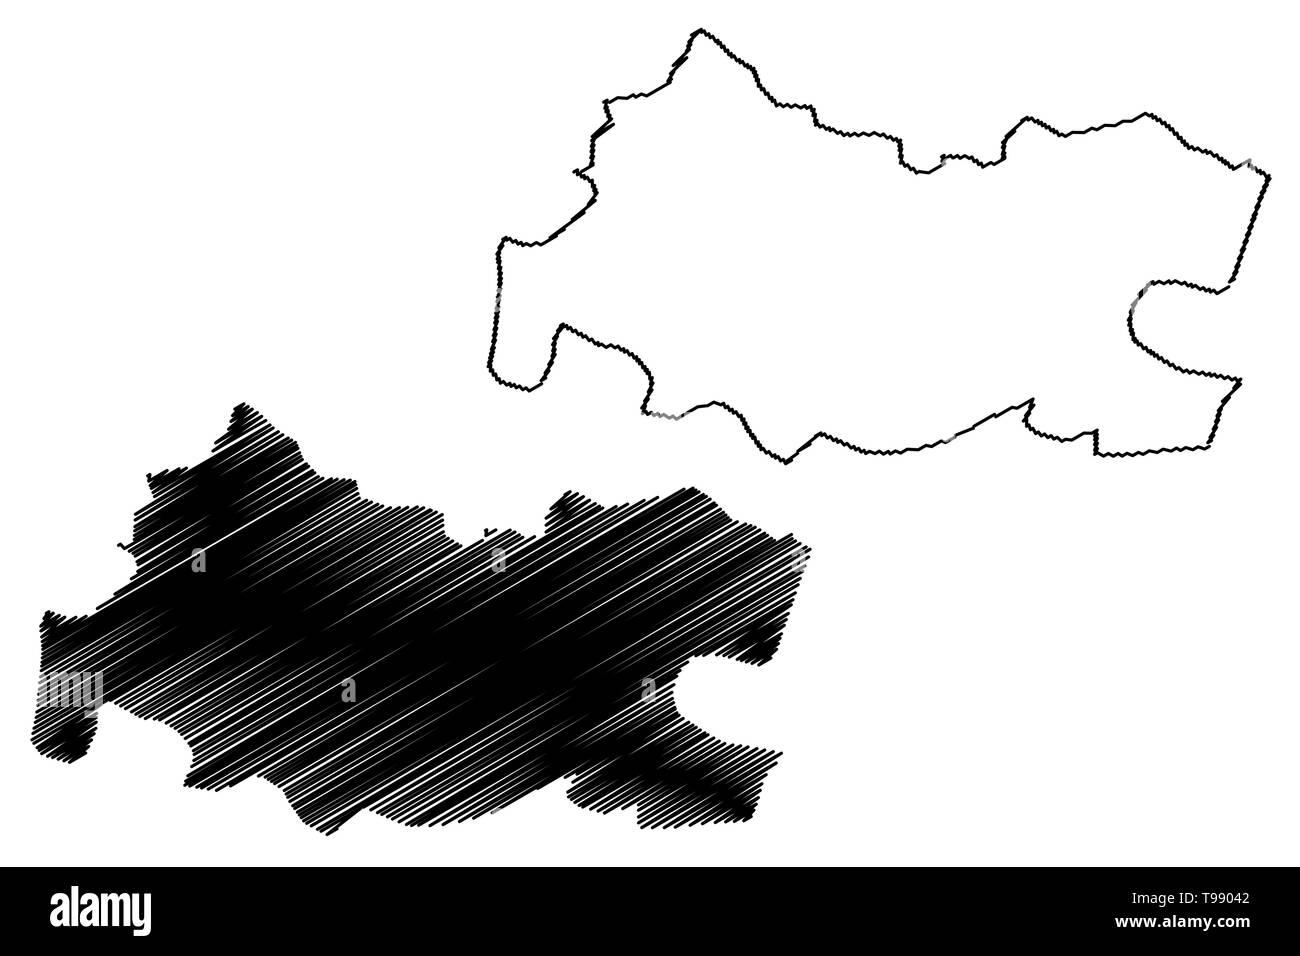 Tissemsilt Province (Provinces of Algeria, Peoples Democratic Republic of Algeria) map vector illustration, scribble sketch Tissemsilt map - Stock Image